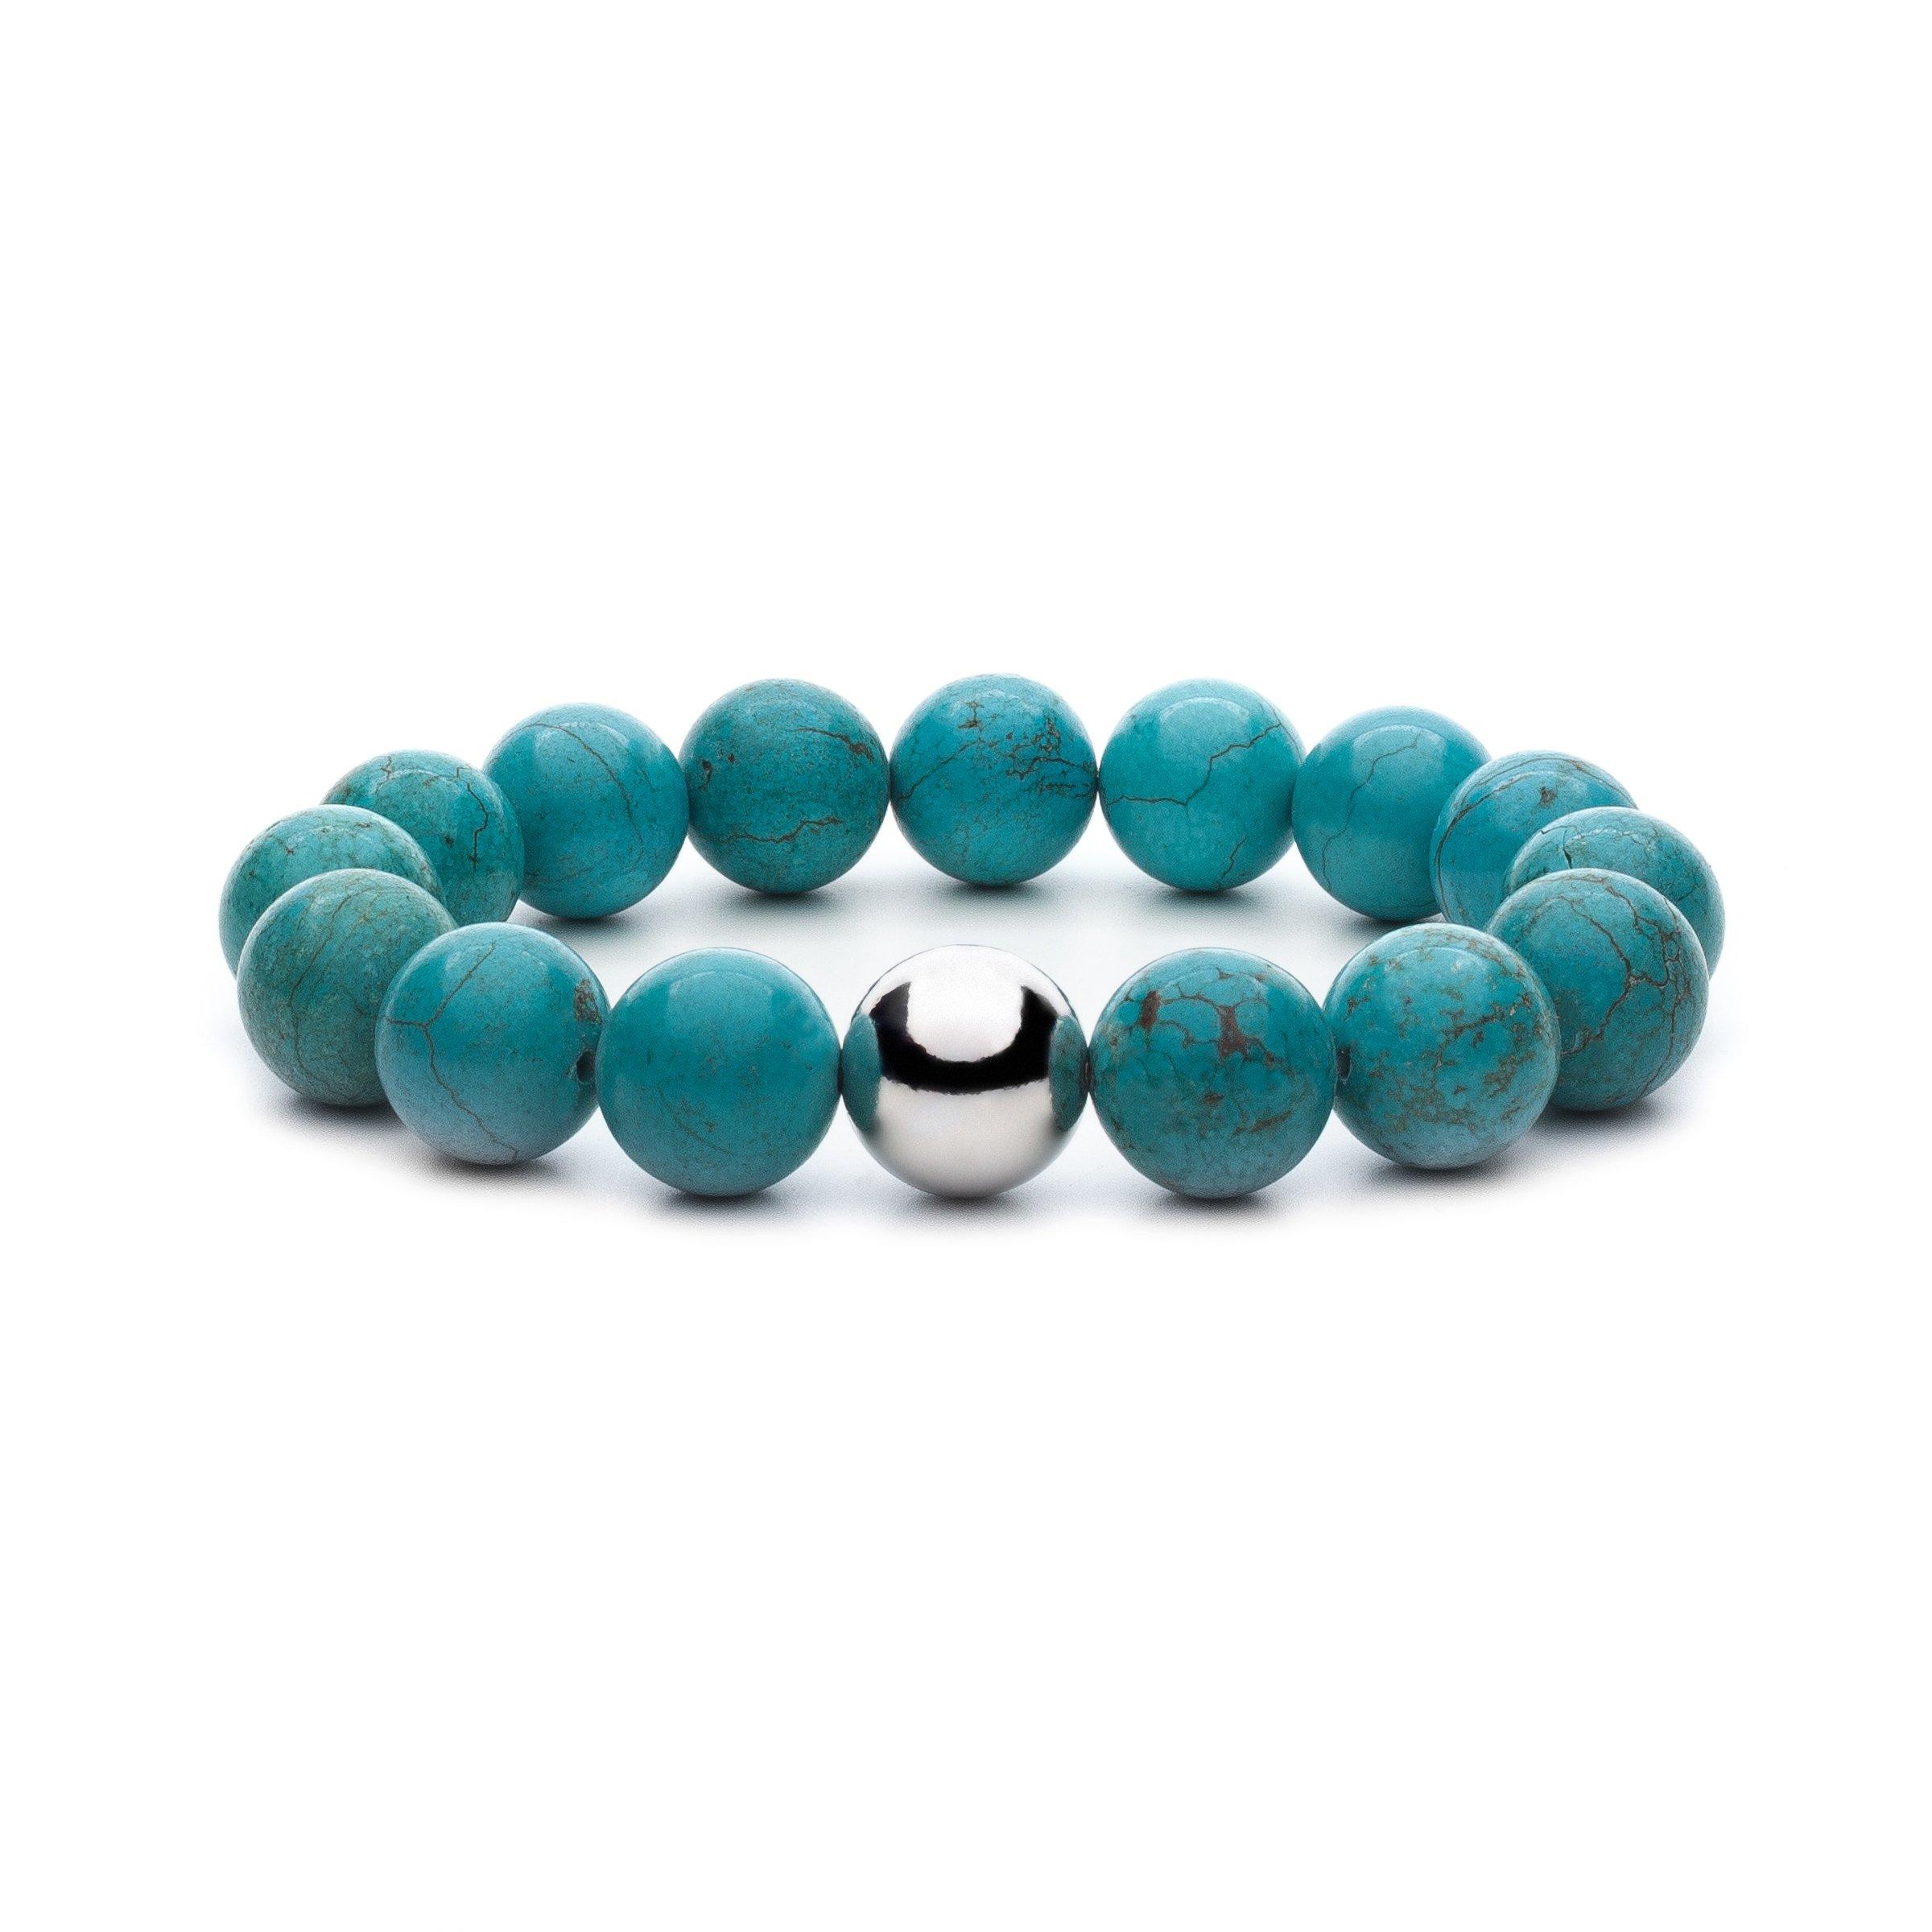 Asortis Women's Turquoise Howlite Sterling Silver Bead 12mm Stretch Bracelet